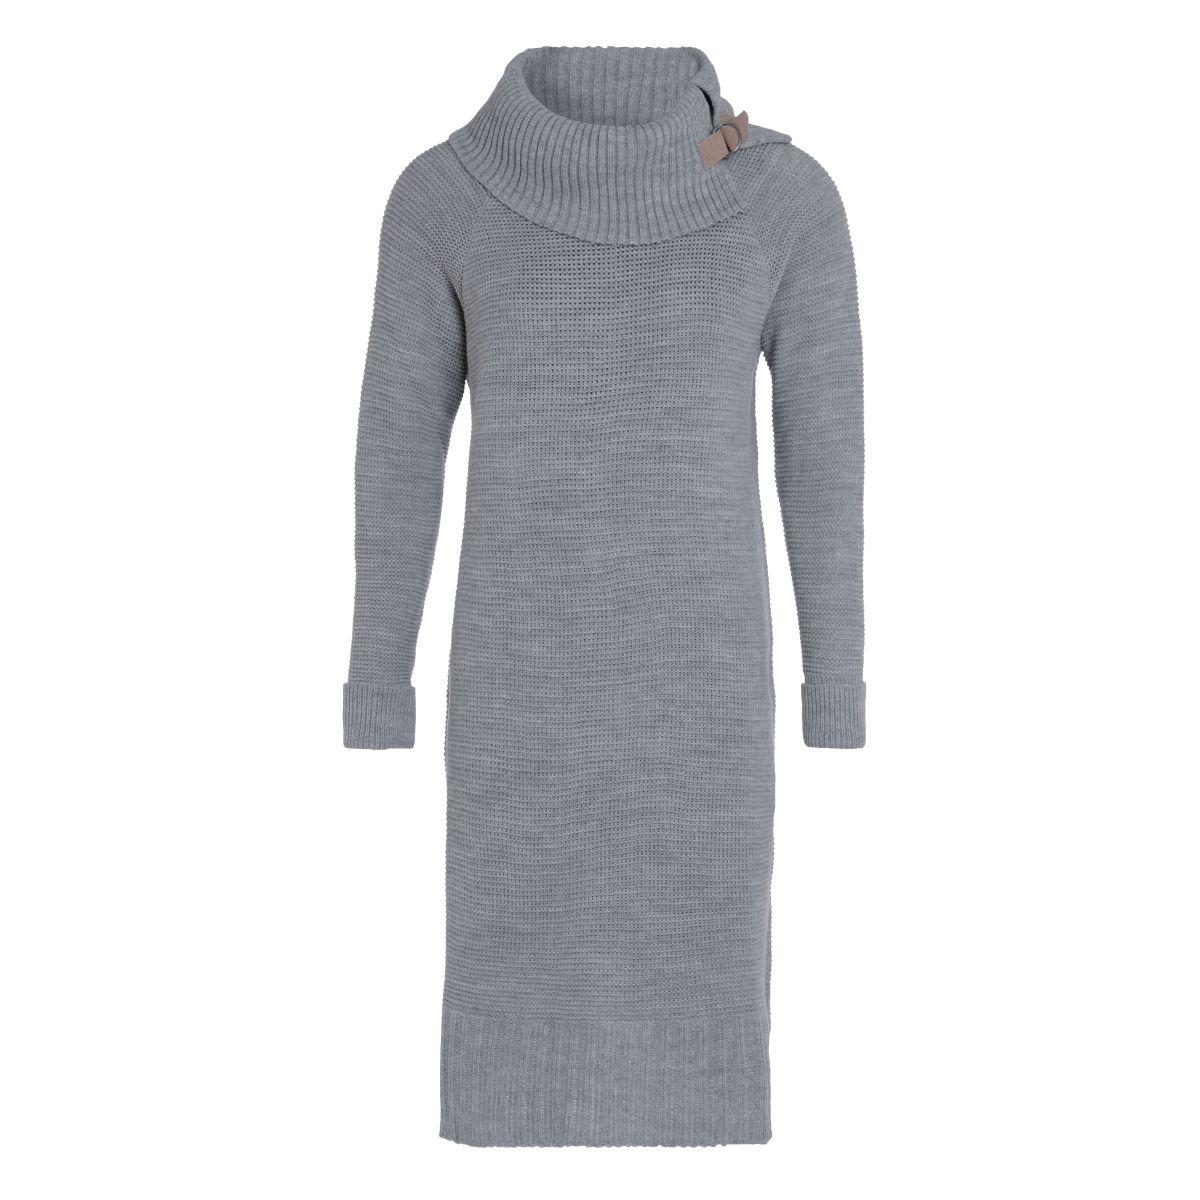 jamie knitted dress light grey 4042